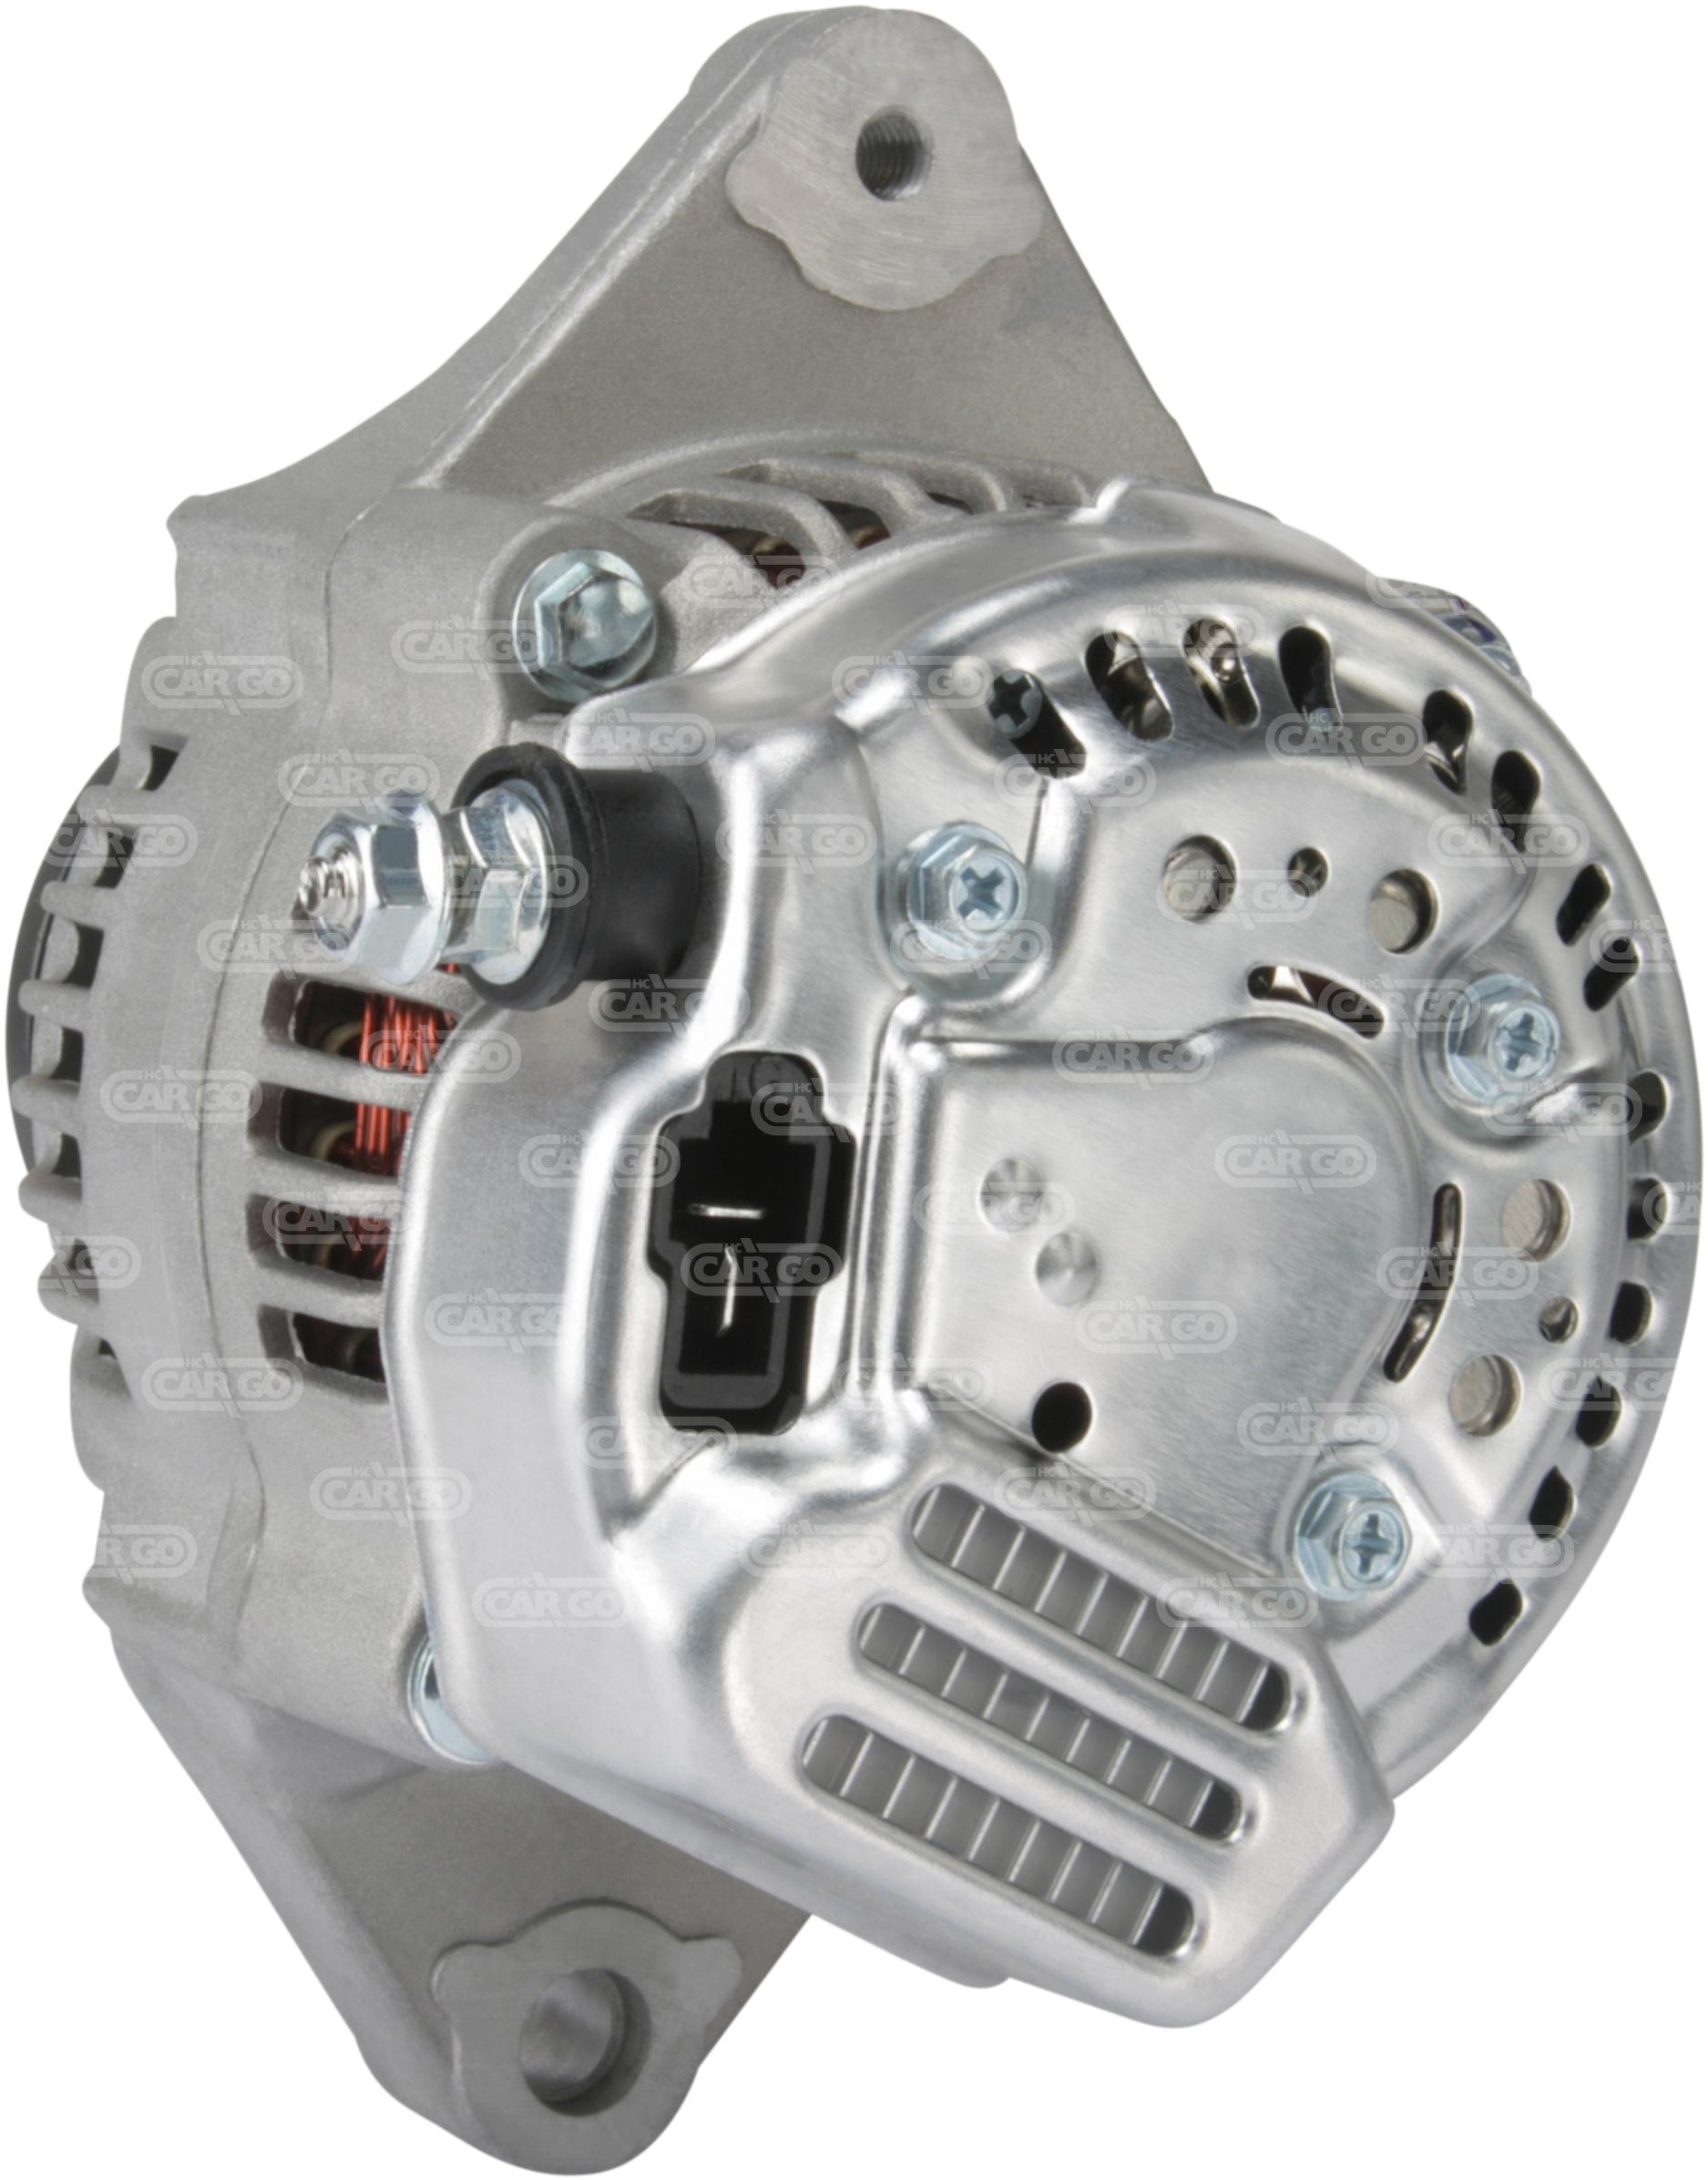 Alternateur 435 Voltage14 Amp50